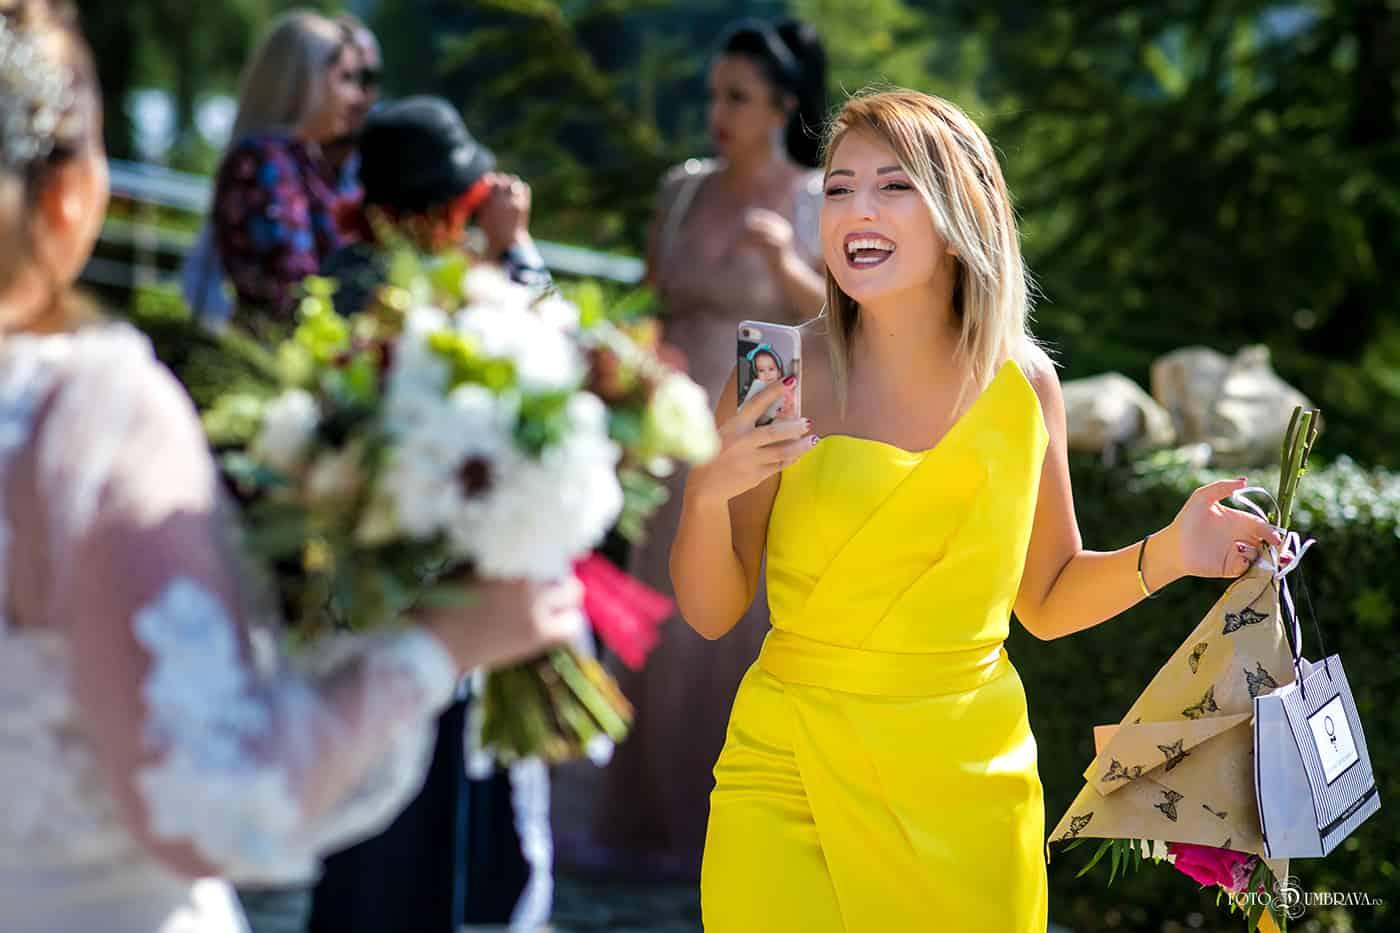 Caut o femeie de nunta)